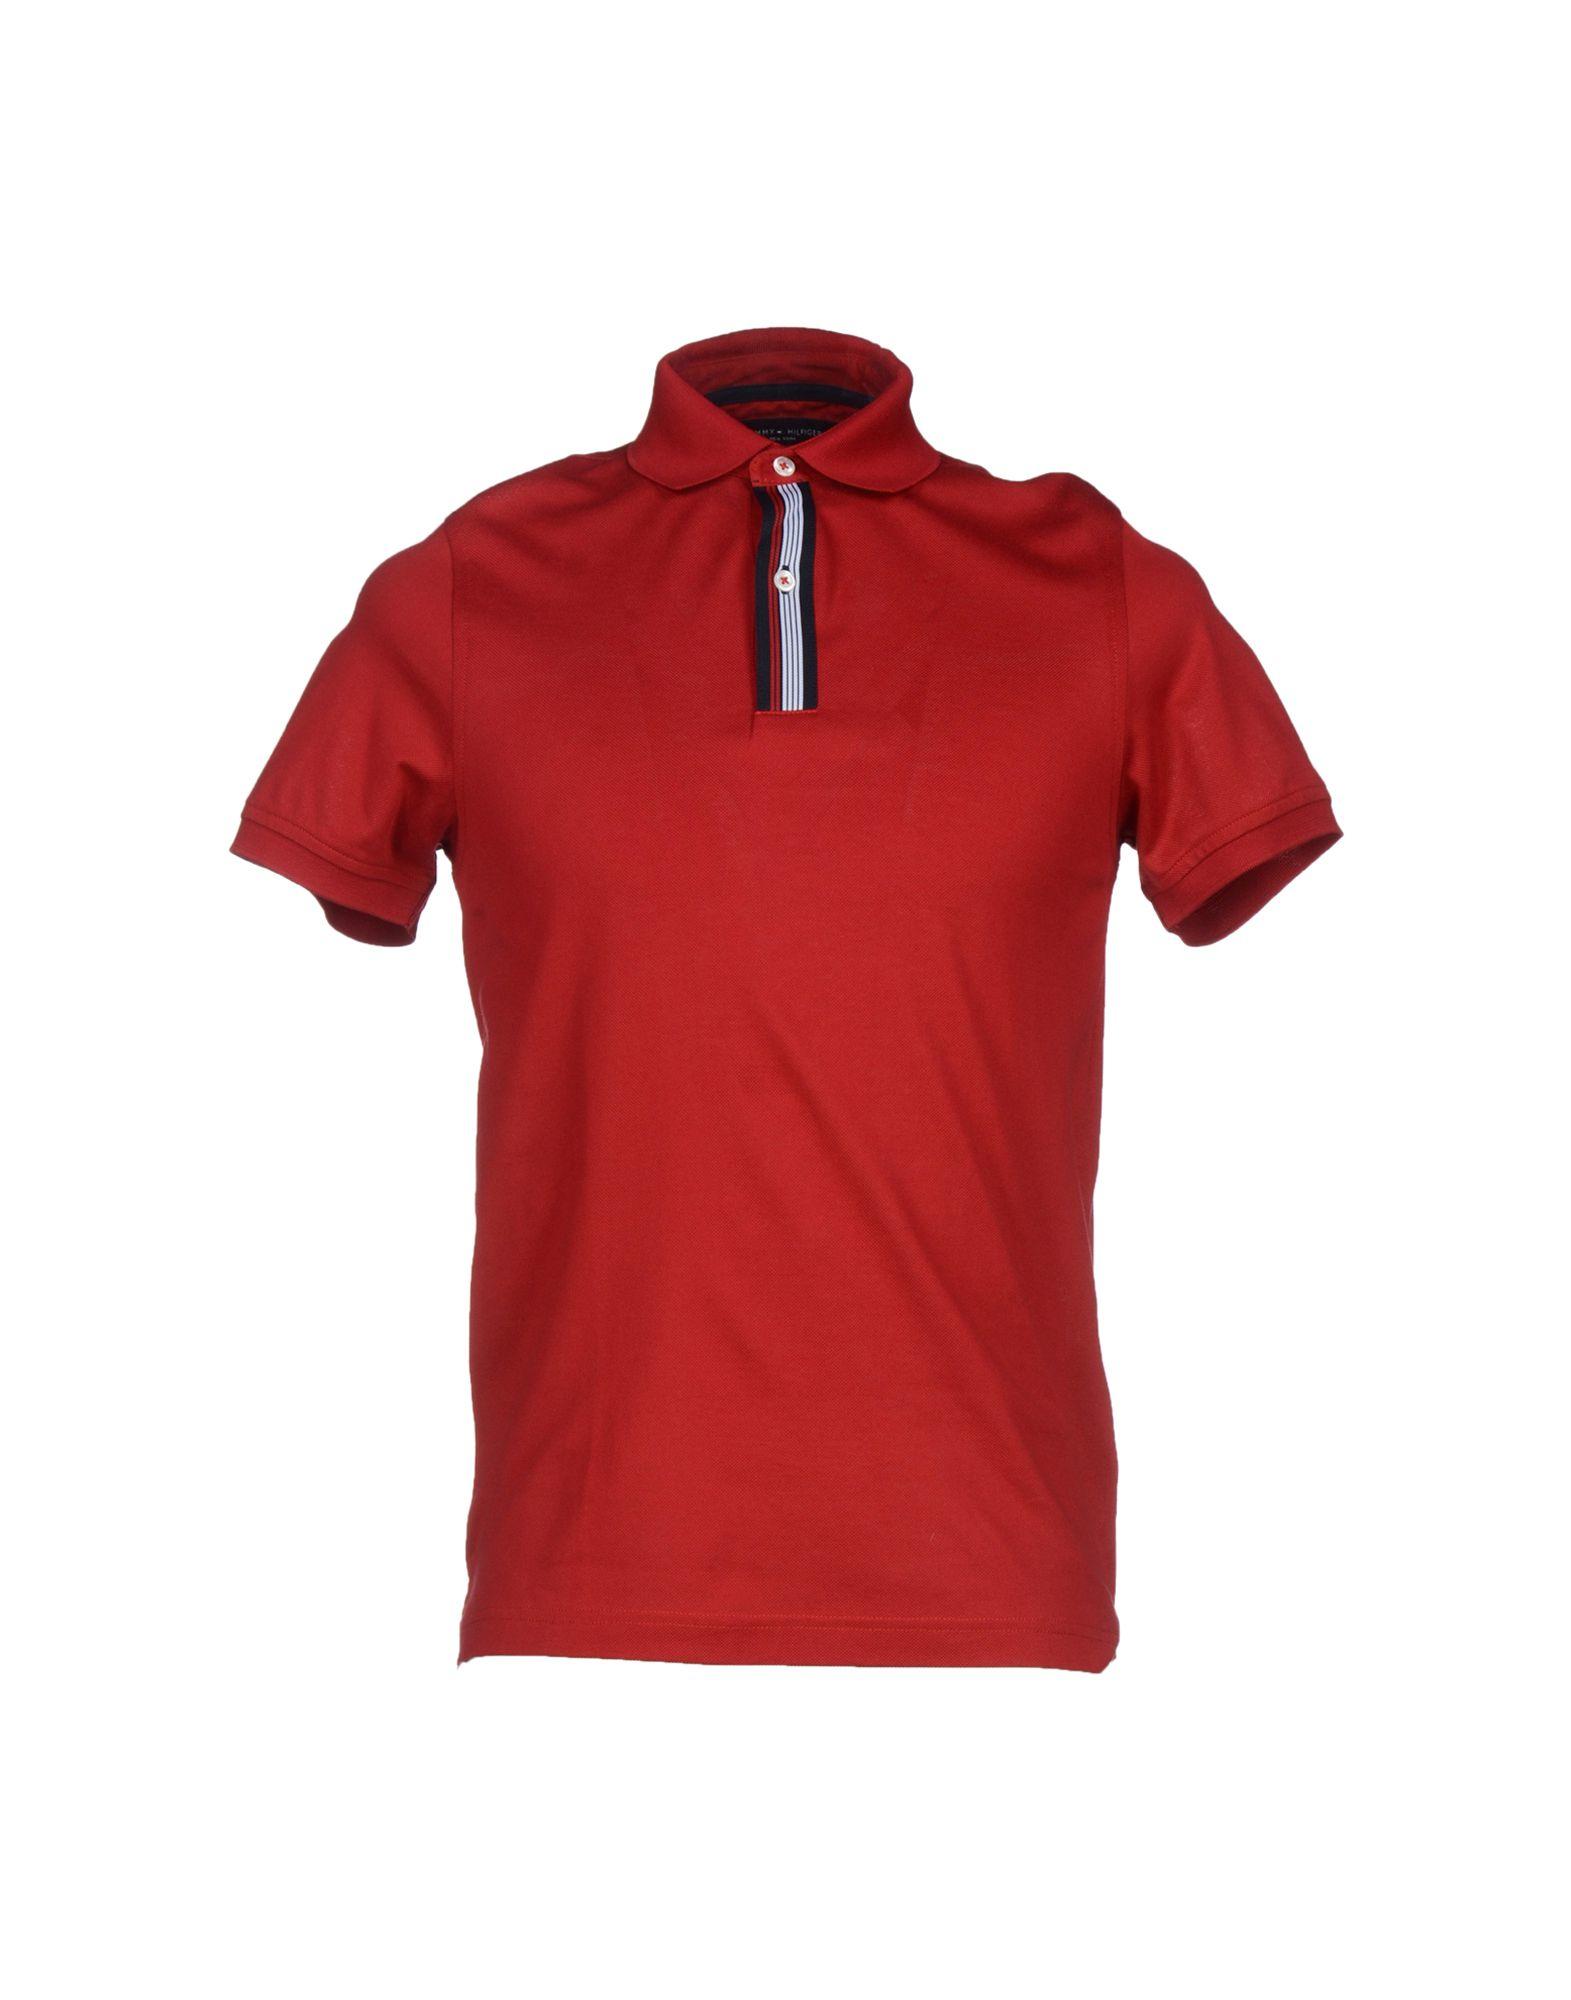 tommy hilfiger polo shirt in red for men lyst. Black Bedroom Furniture Sets. Home Design Ideas